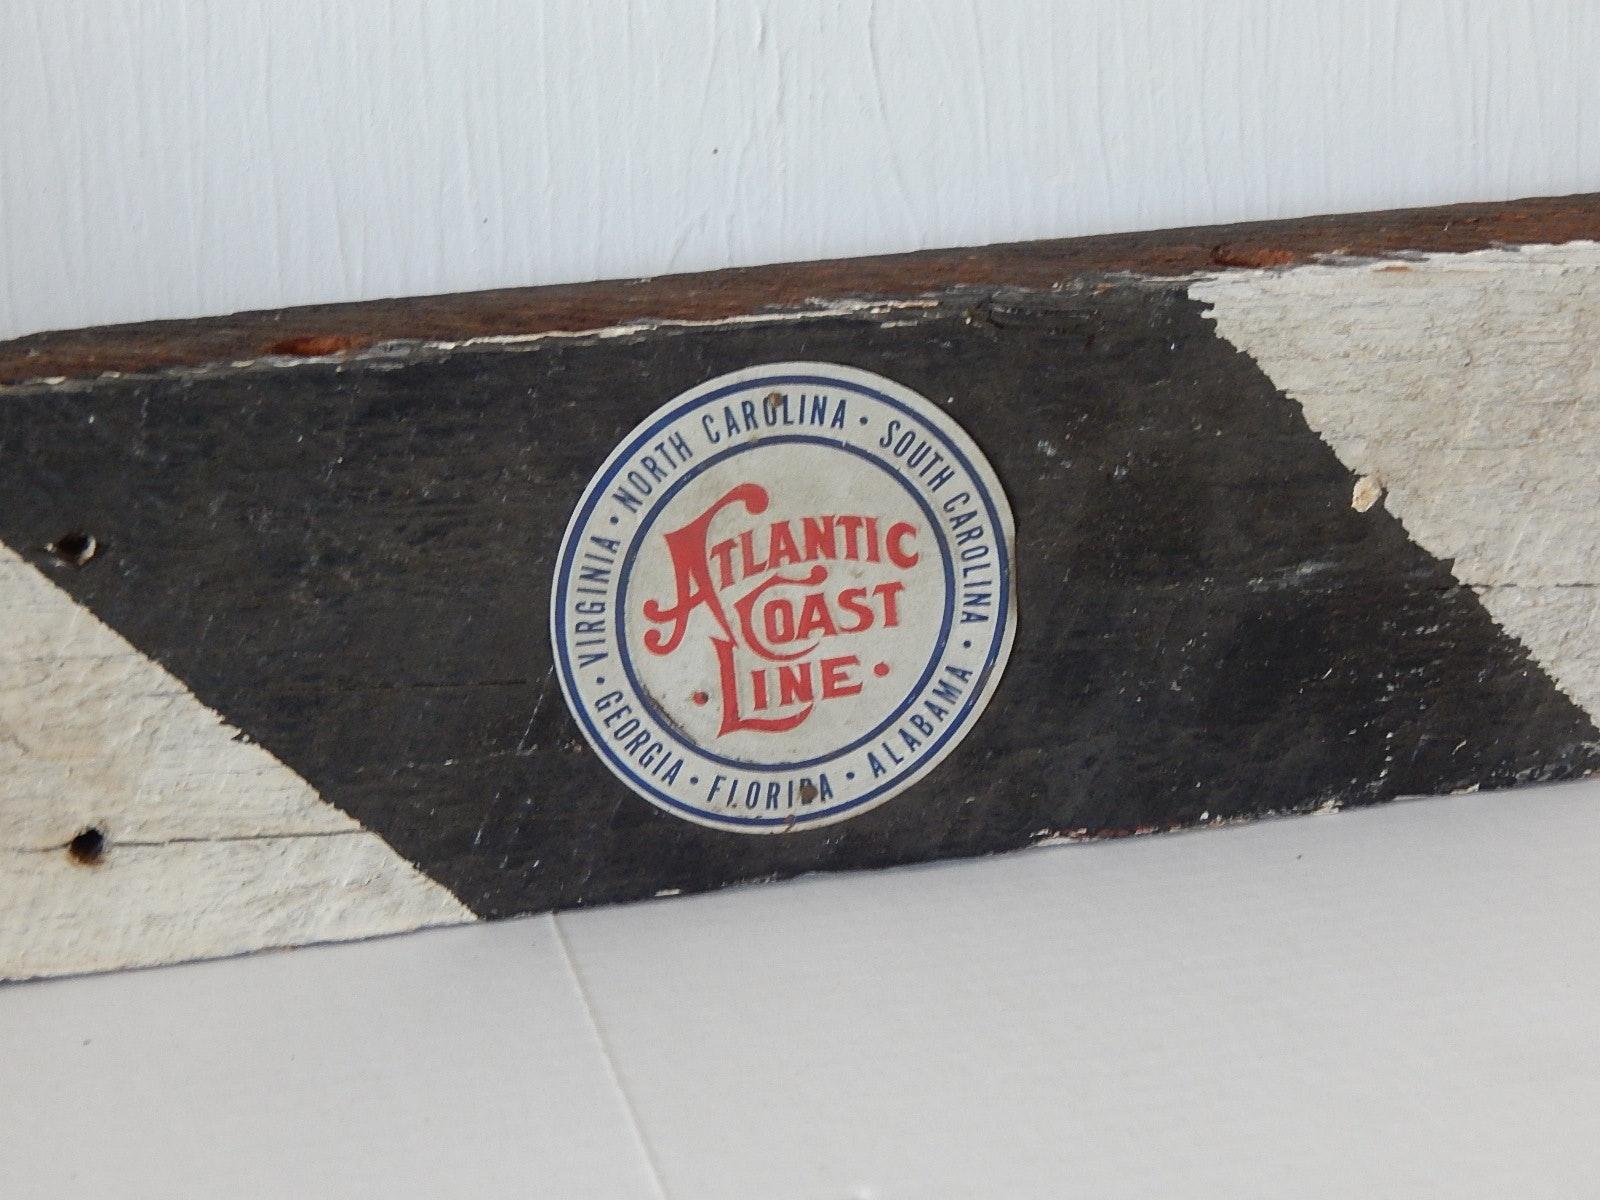 Painted Vintage Railroad Crossing Arm